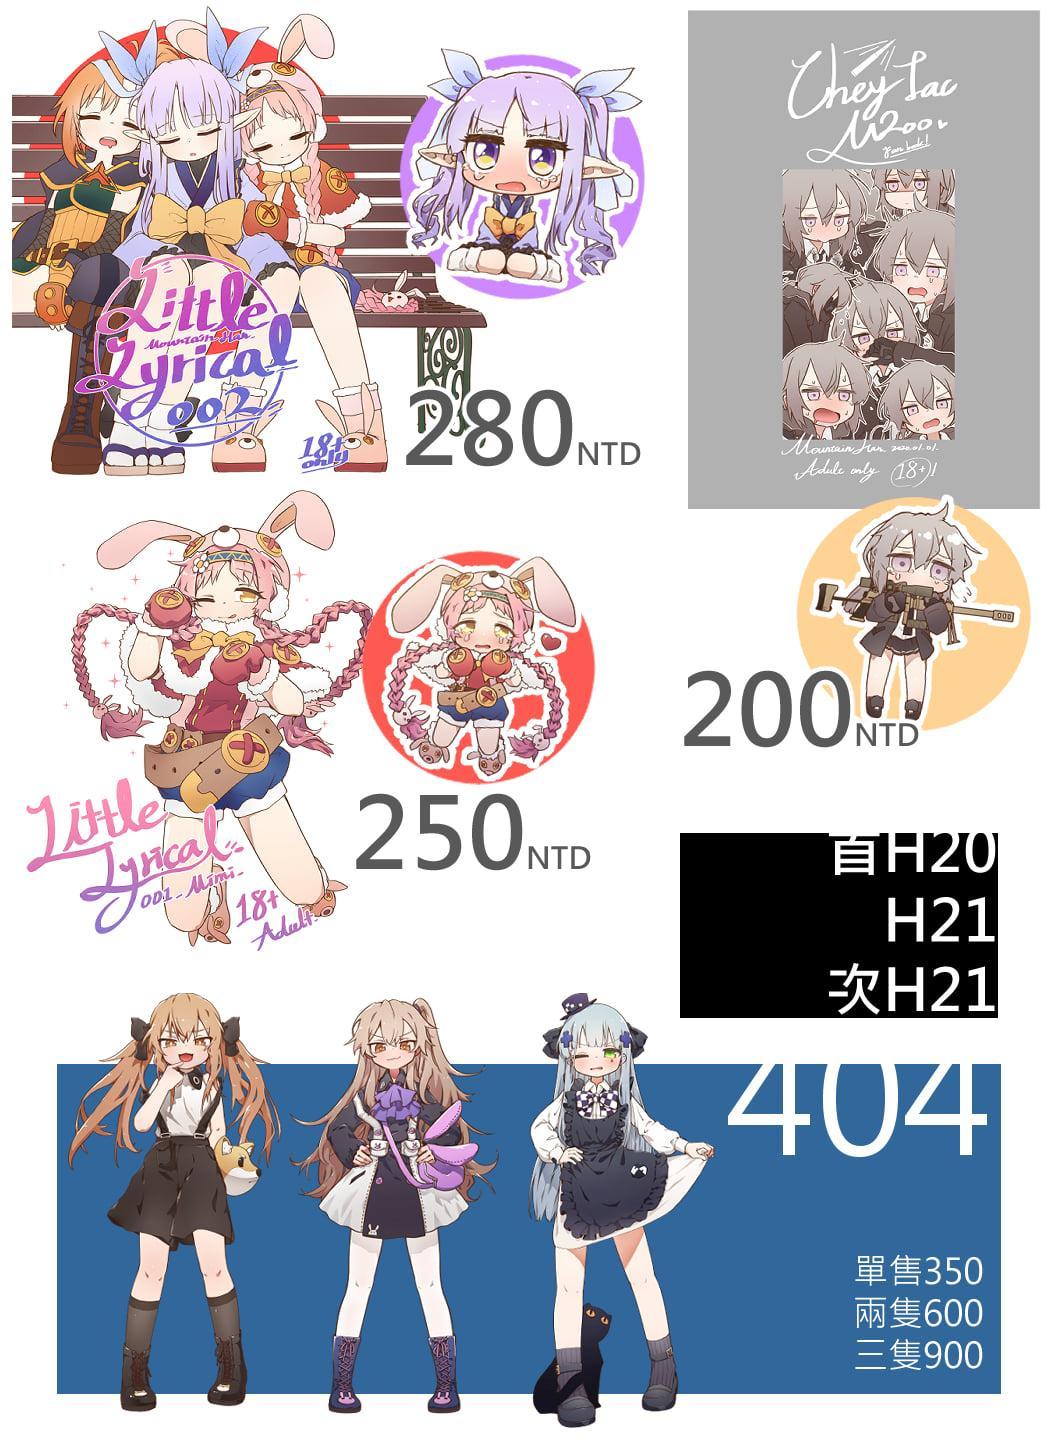 [MountainHan(山含)] Little Lyrical-MiMi 001 (Princess Connect! Re:Dive) [Chinese] [切嚕系女子個人搬運] [Decensored] +小宣傳 16